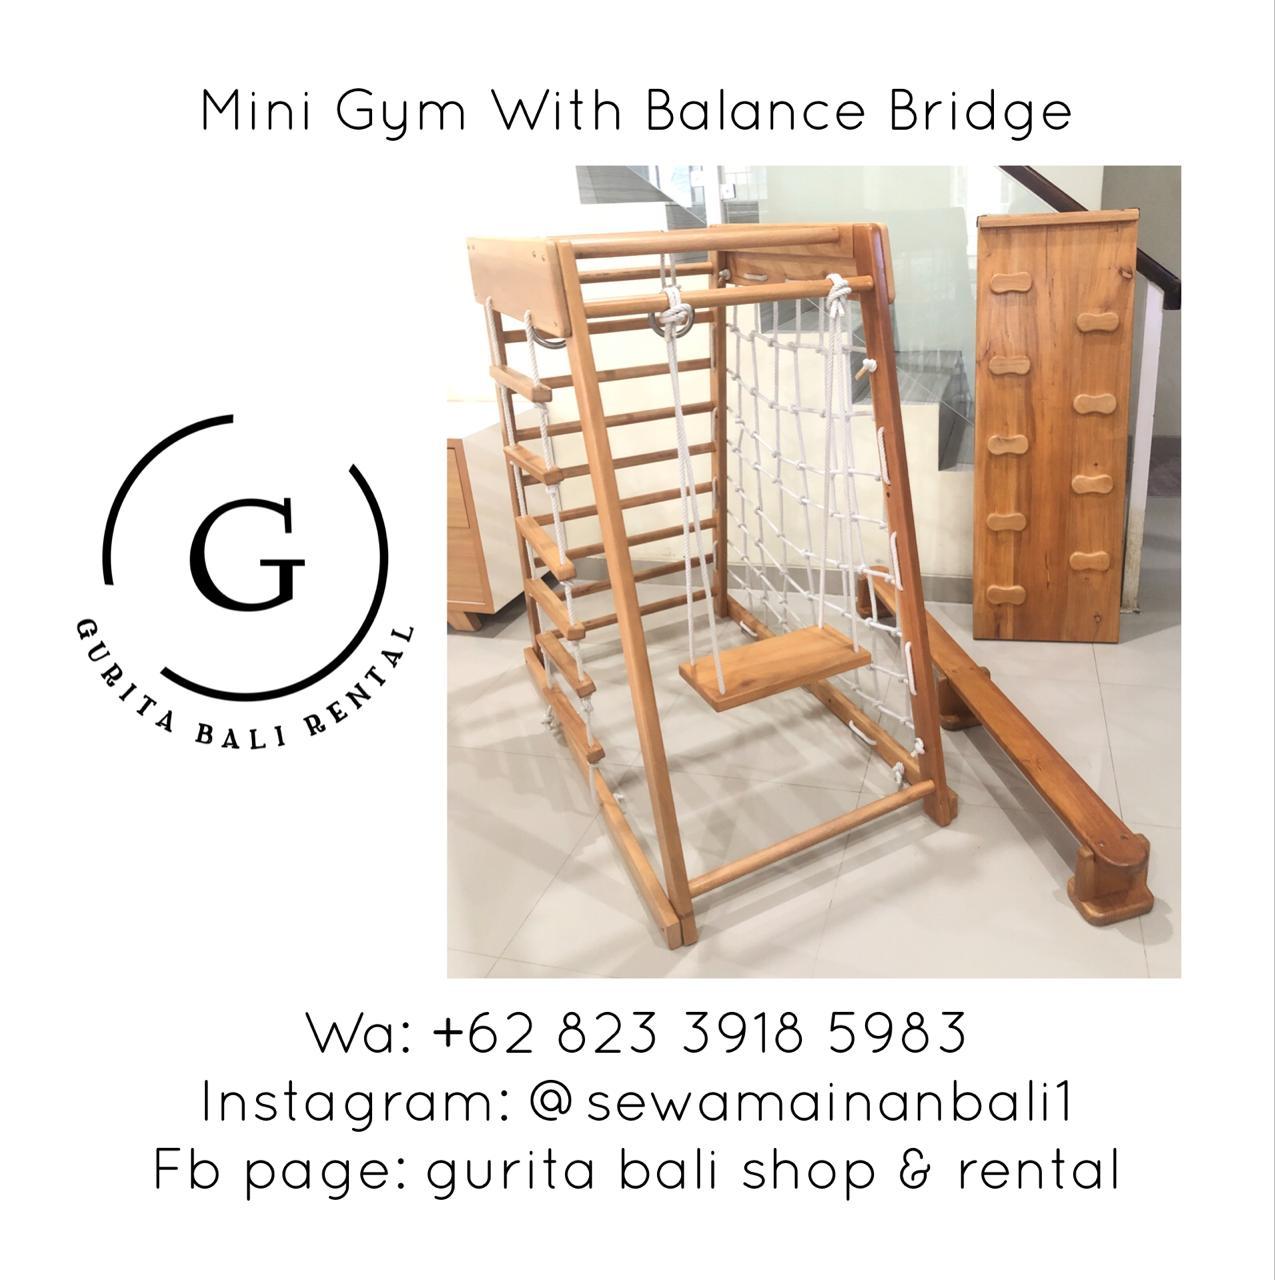 MINI GYM WITH BALANCE BRIDGE 4